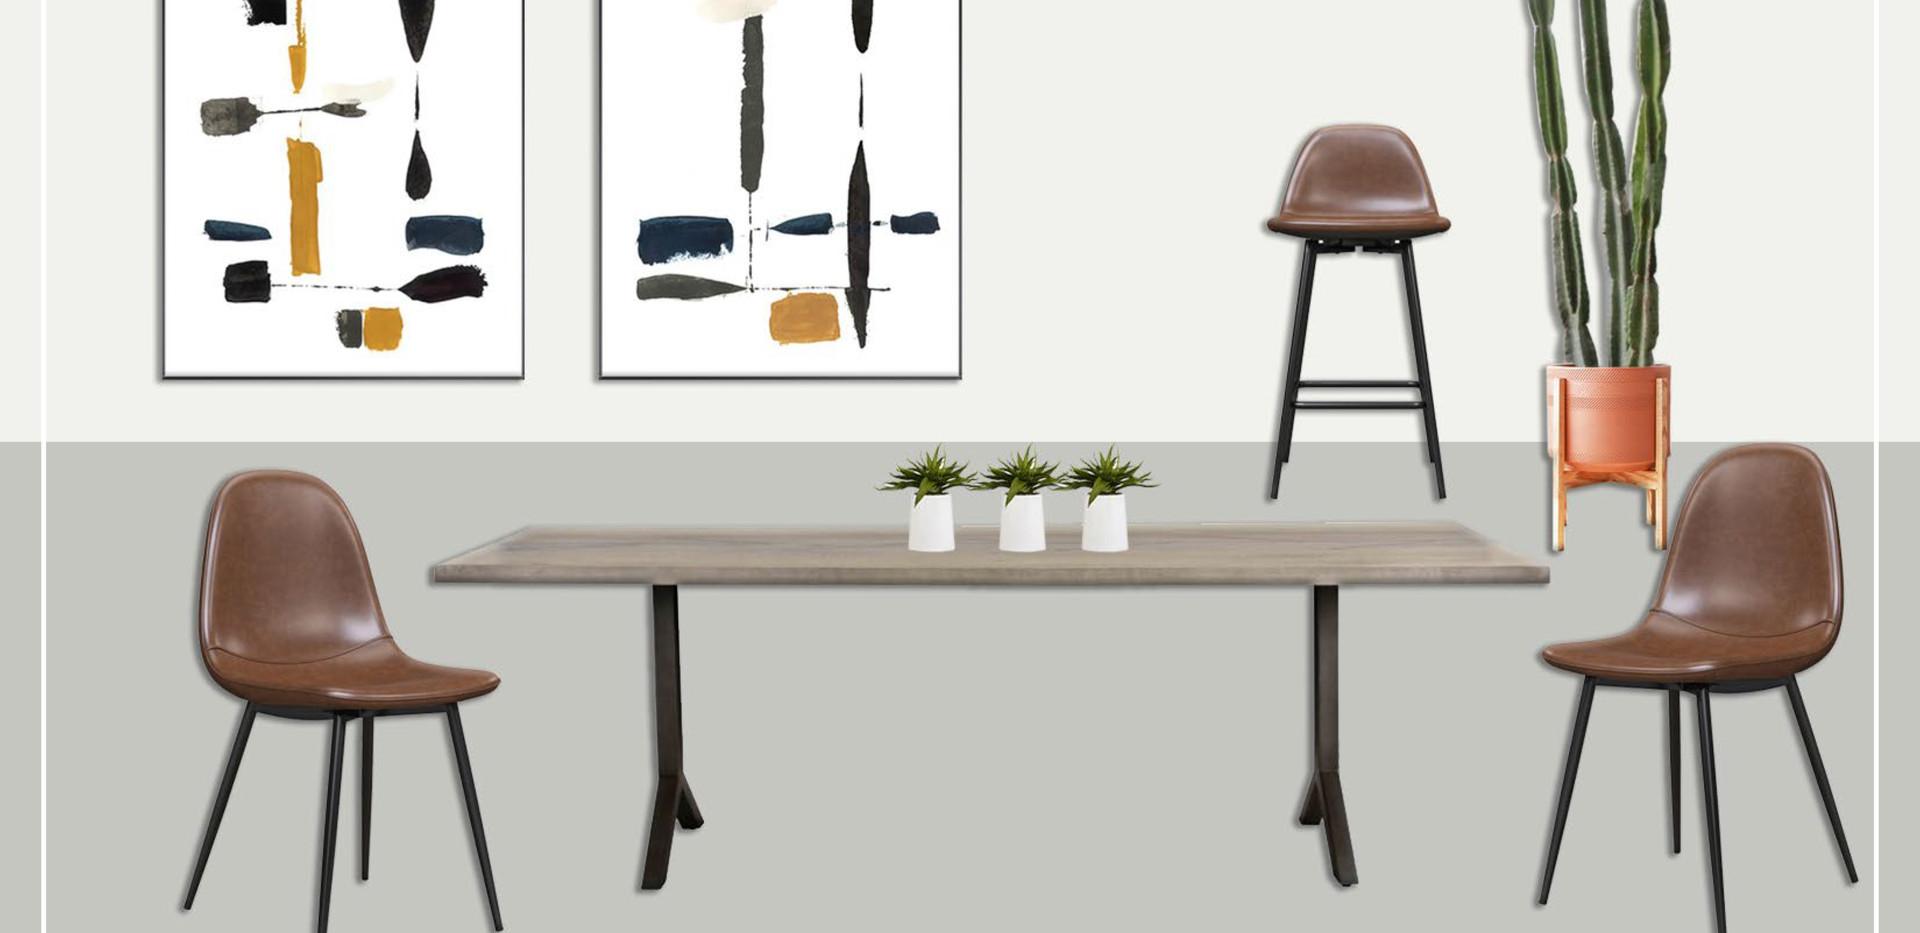 Dining Room | Original Concept Collage